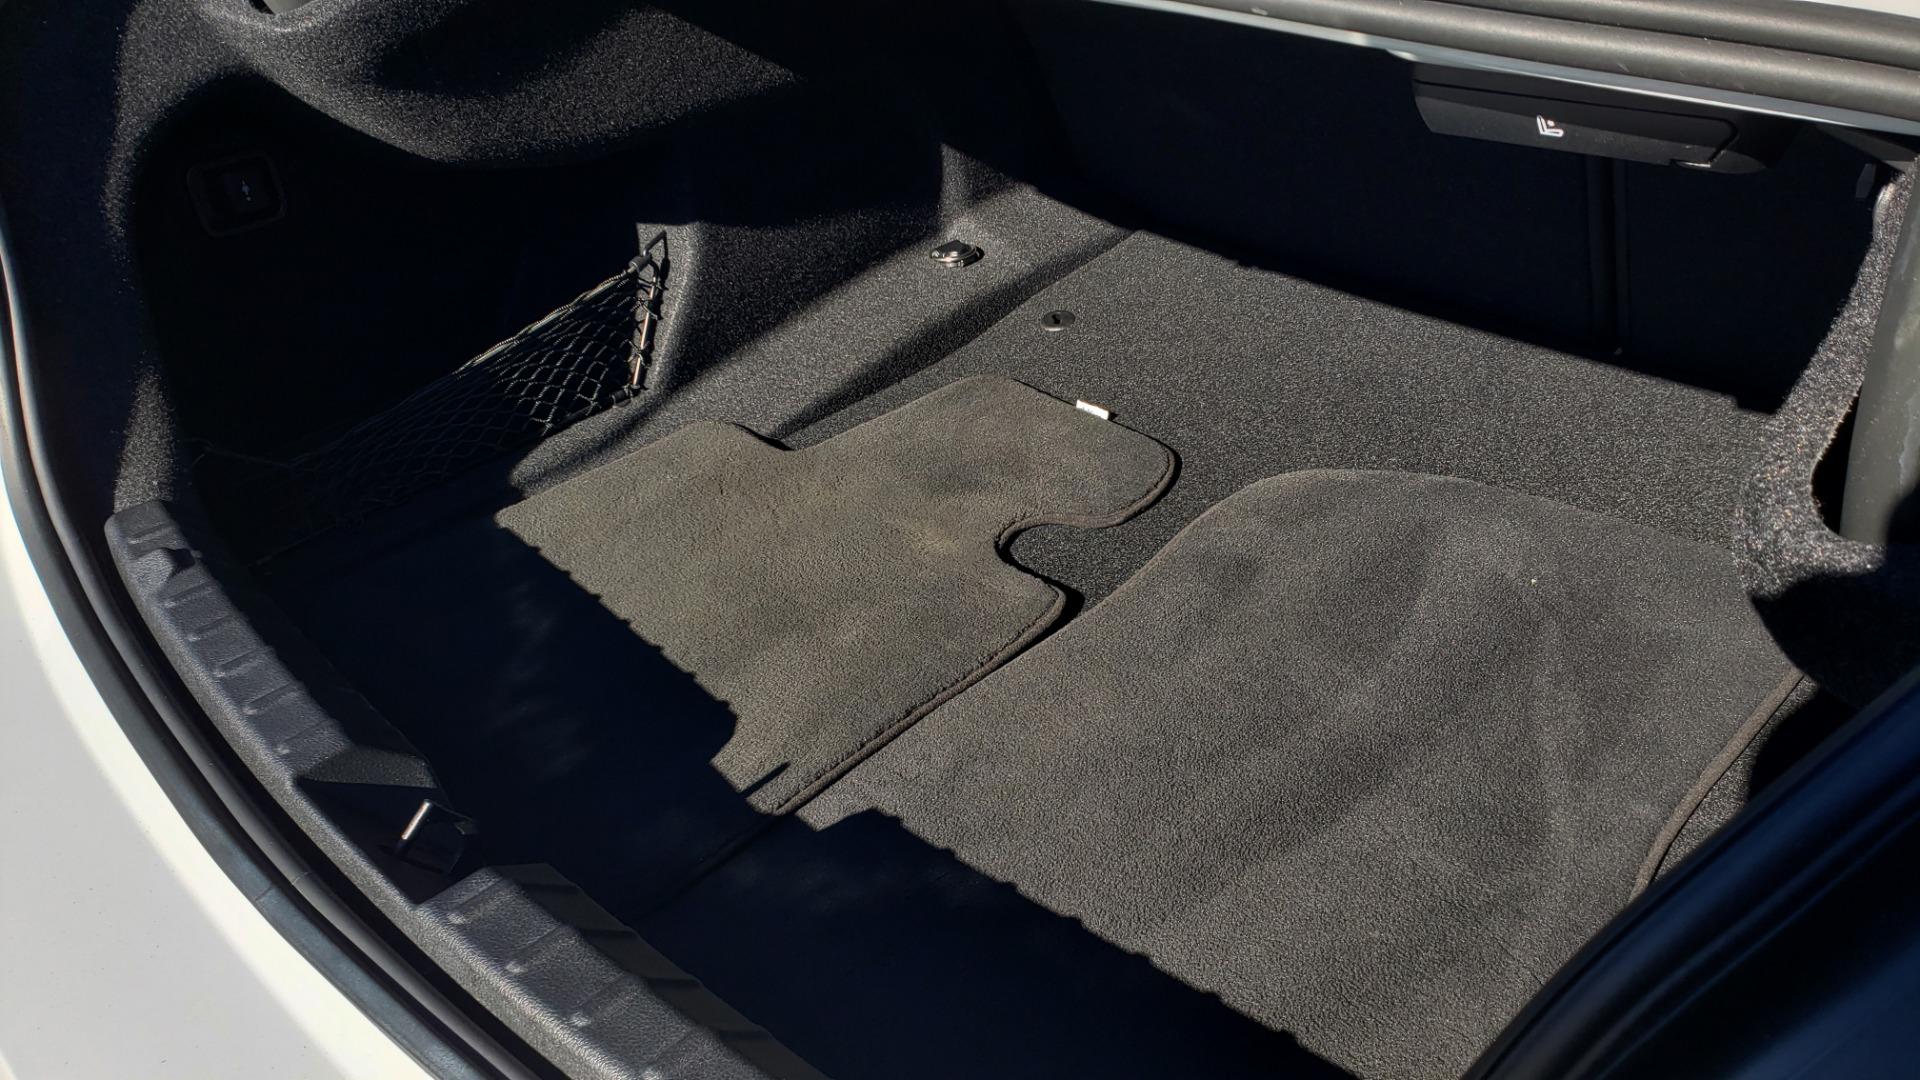 Used 2018 BMW M4 COMP PKG / EXEC / M-DRIVER / PARK CNTRL / ACTIVE BLIND SPOT for sale Sold at Formula Imports in Charlotte NC 28227 24